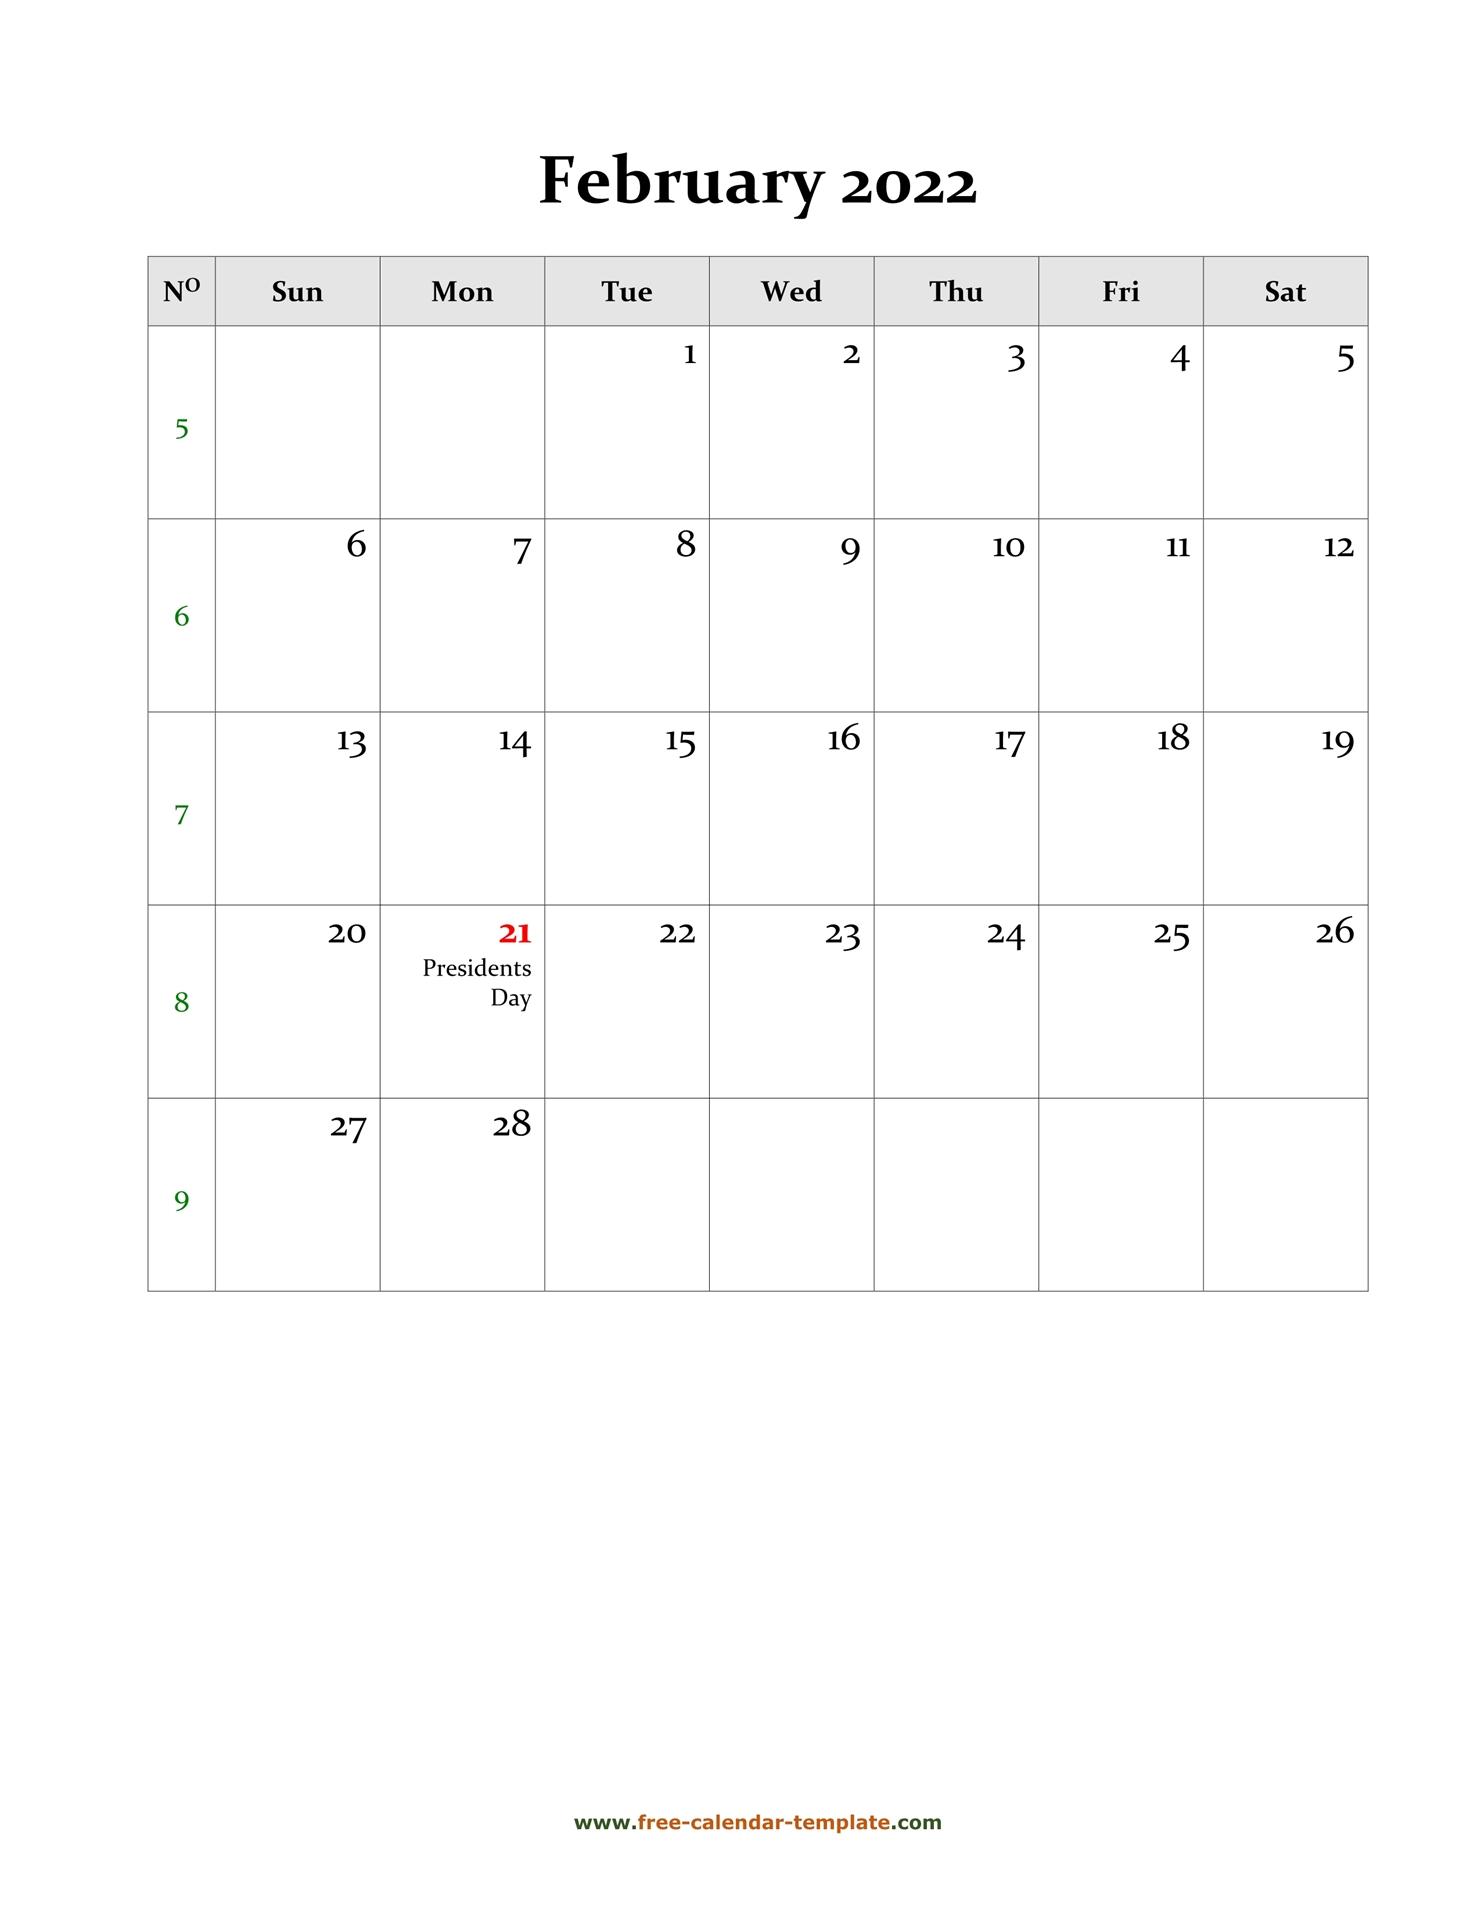 2022 February Calendar (Blank Vertical Template) | Free Throughout Blank Calendar For February 2022